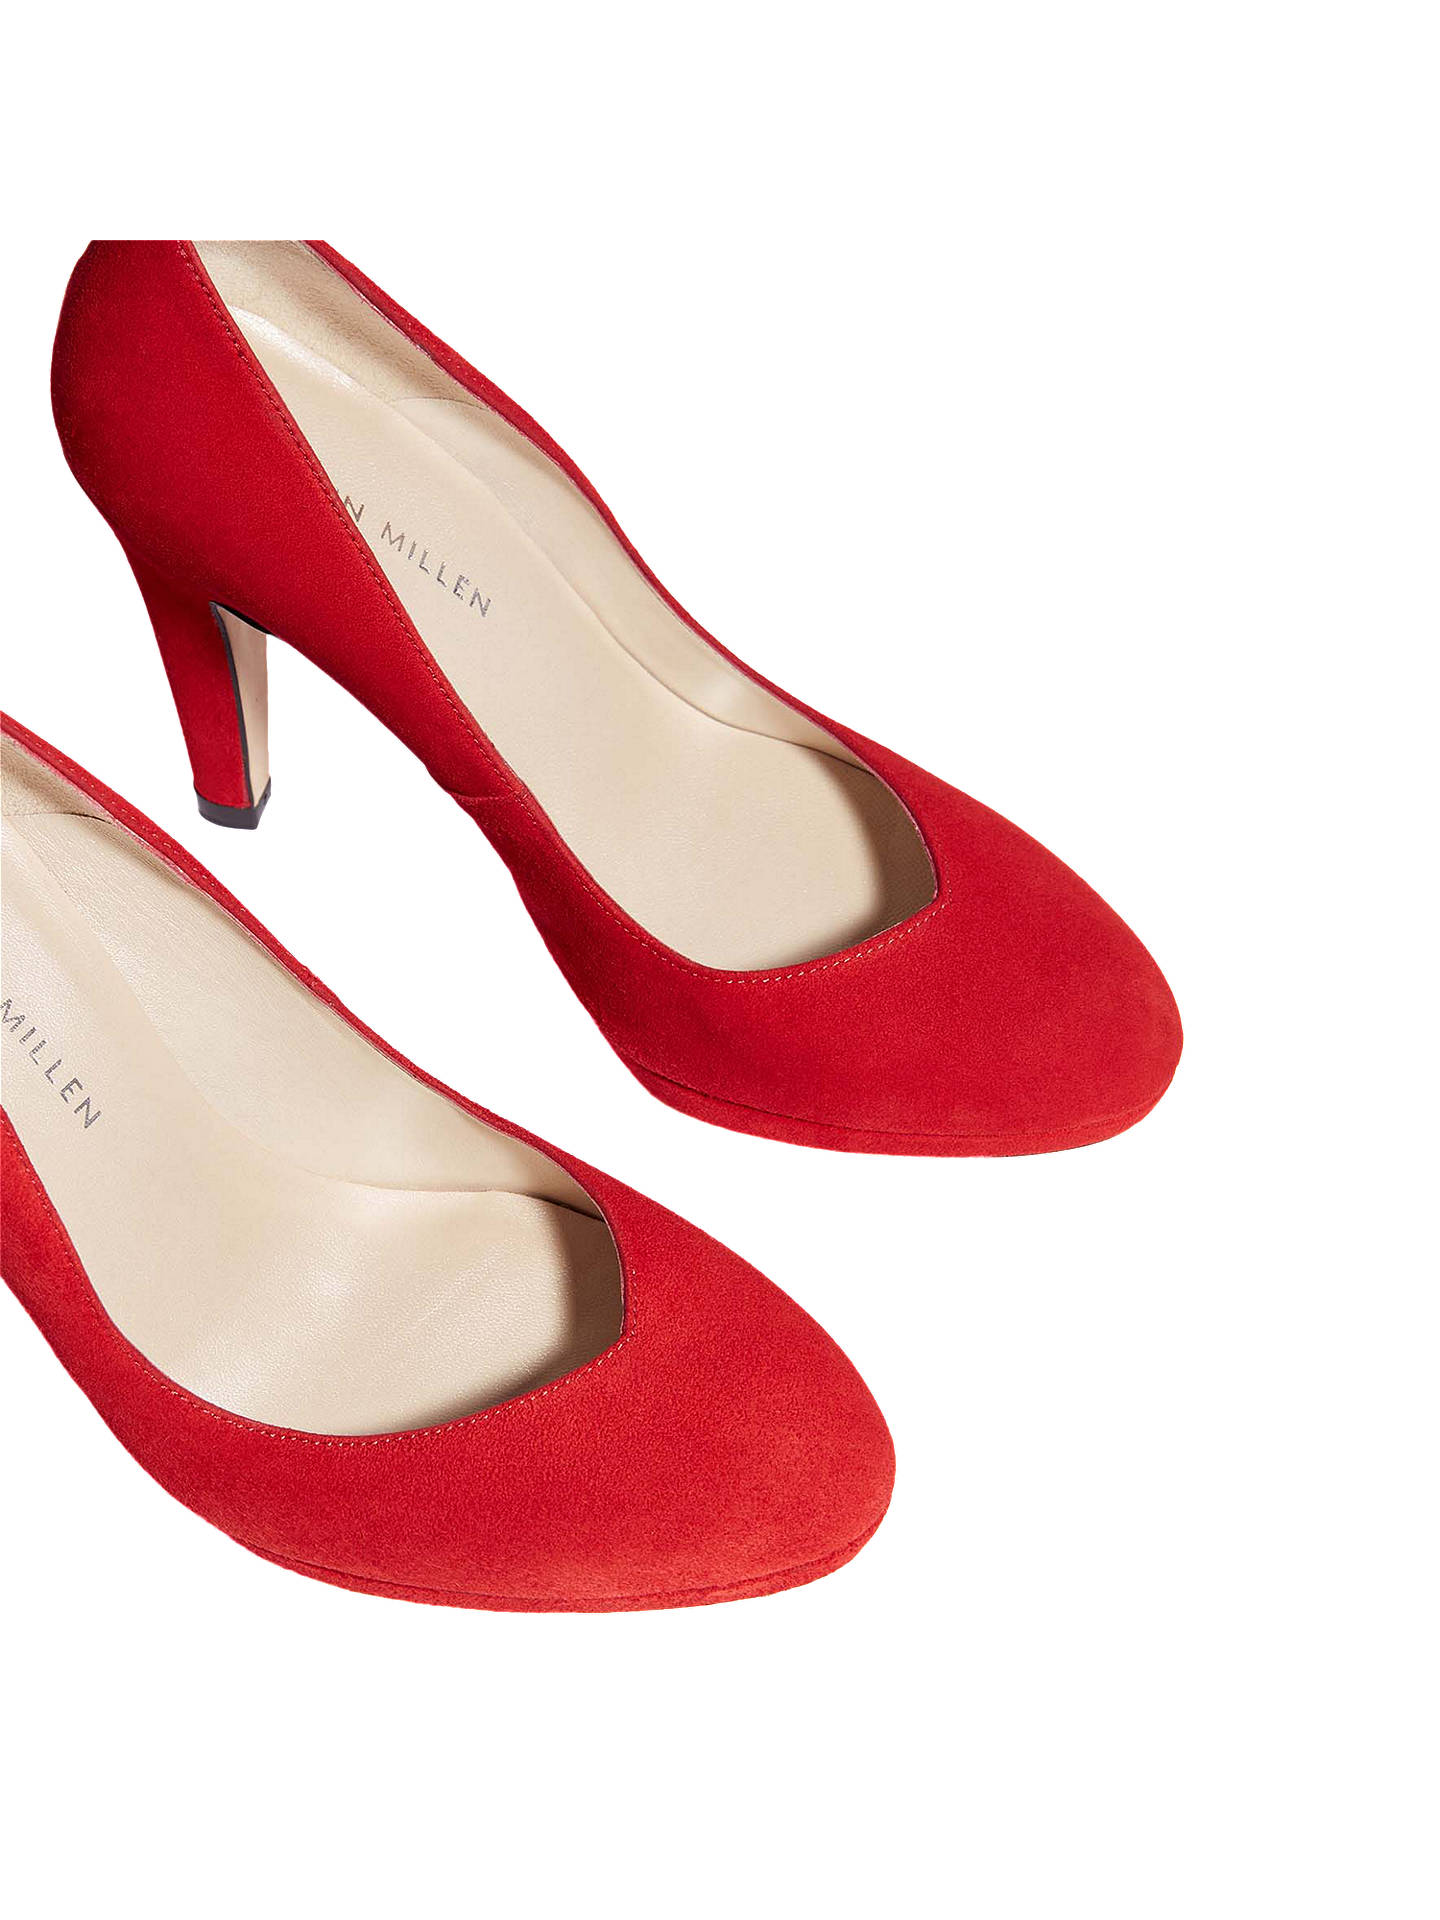 374f93e8b48 Karen Millen Platform Court Shoes at John Lewis & Partners